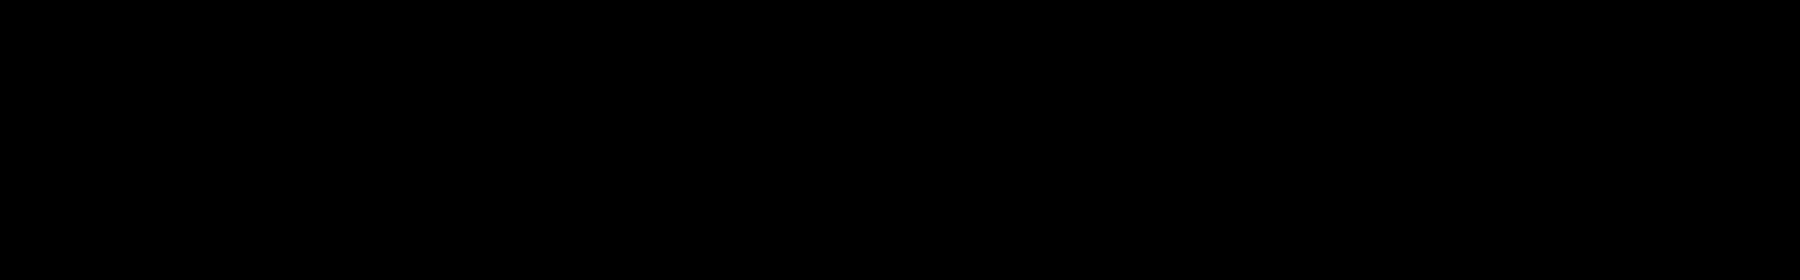 American Sauce audio waveform